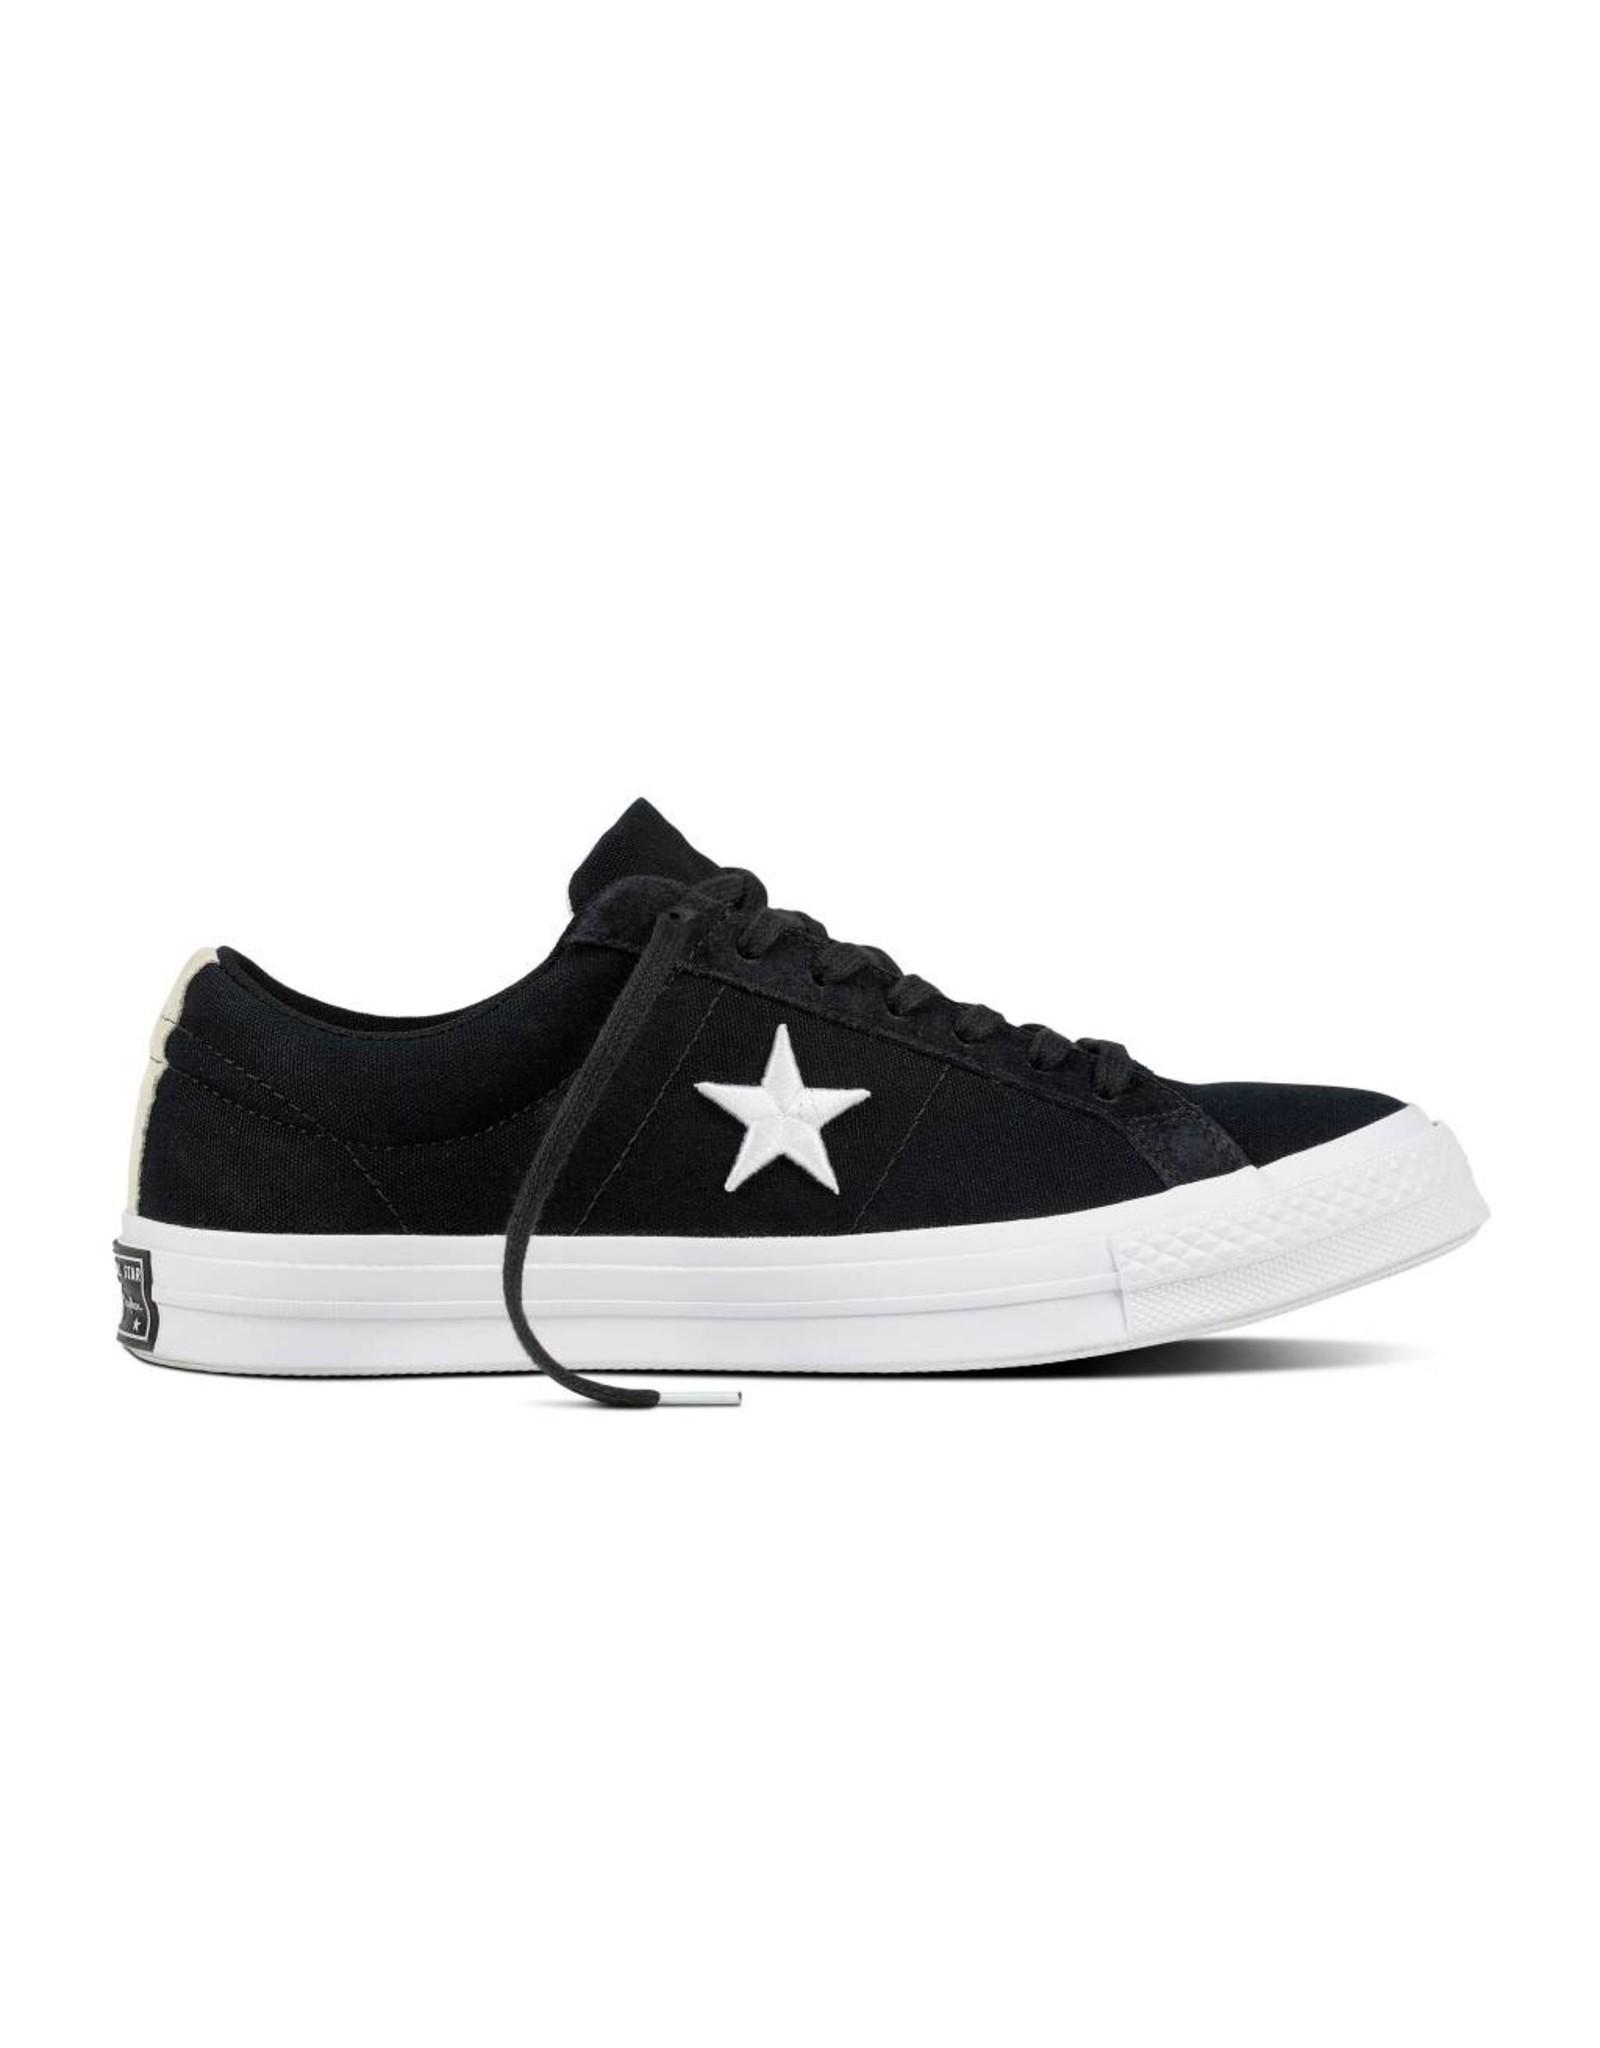 CONVERSE ONE STAR OX BLACK/WHITE/WHITE C887BW-160600C